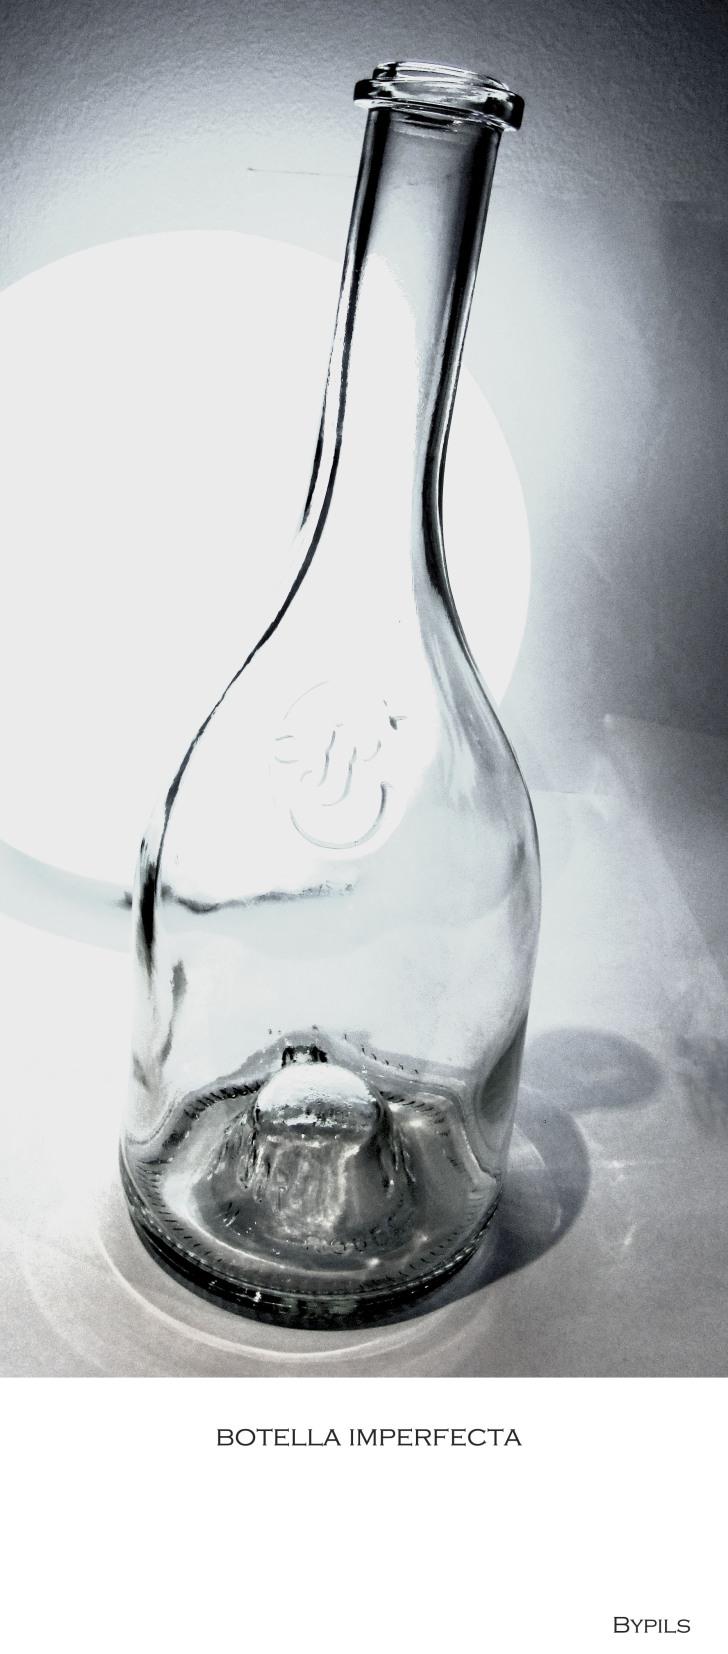 botellaimperfecta2